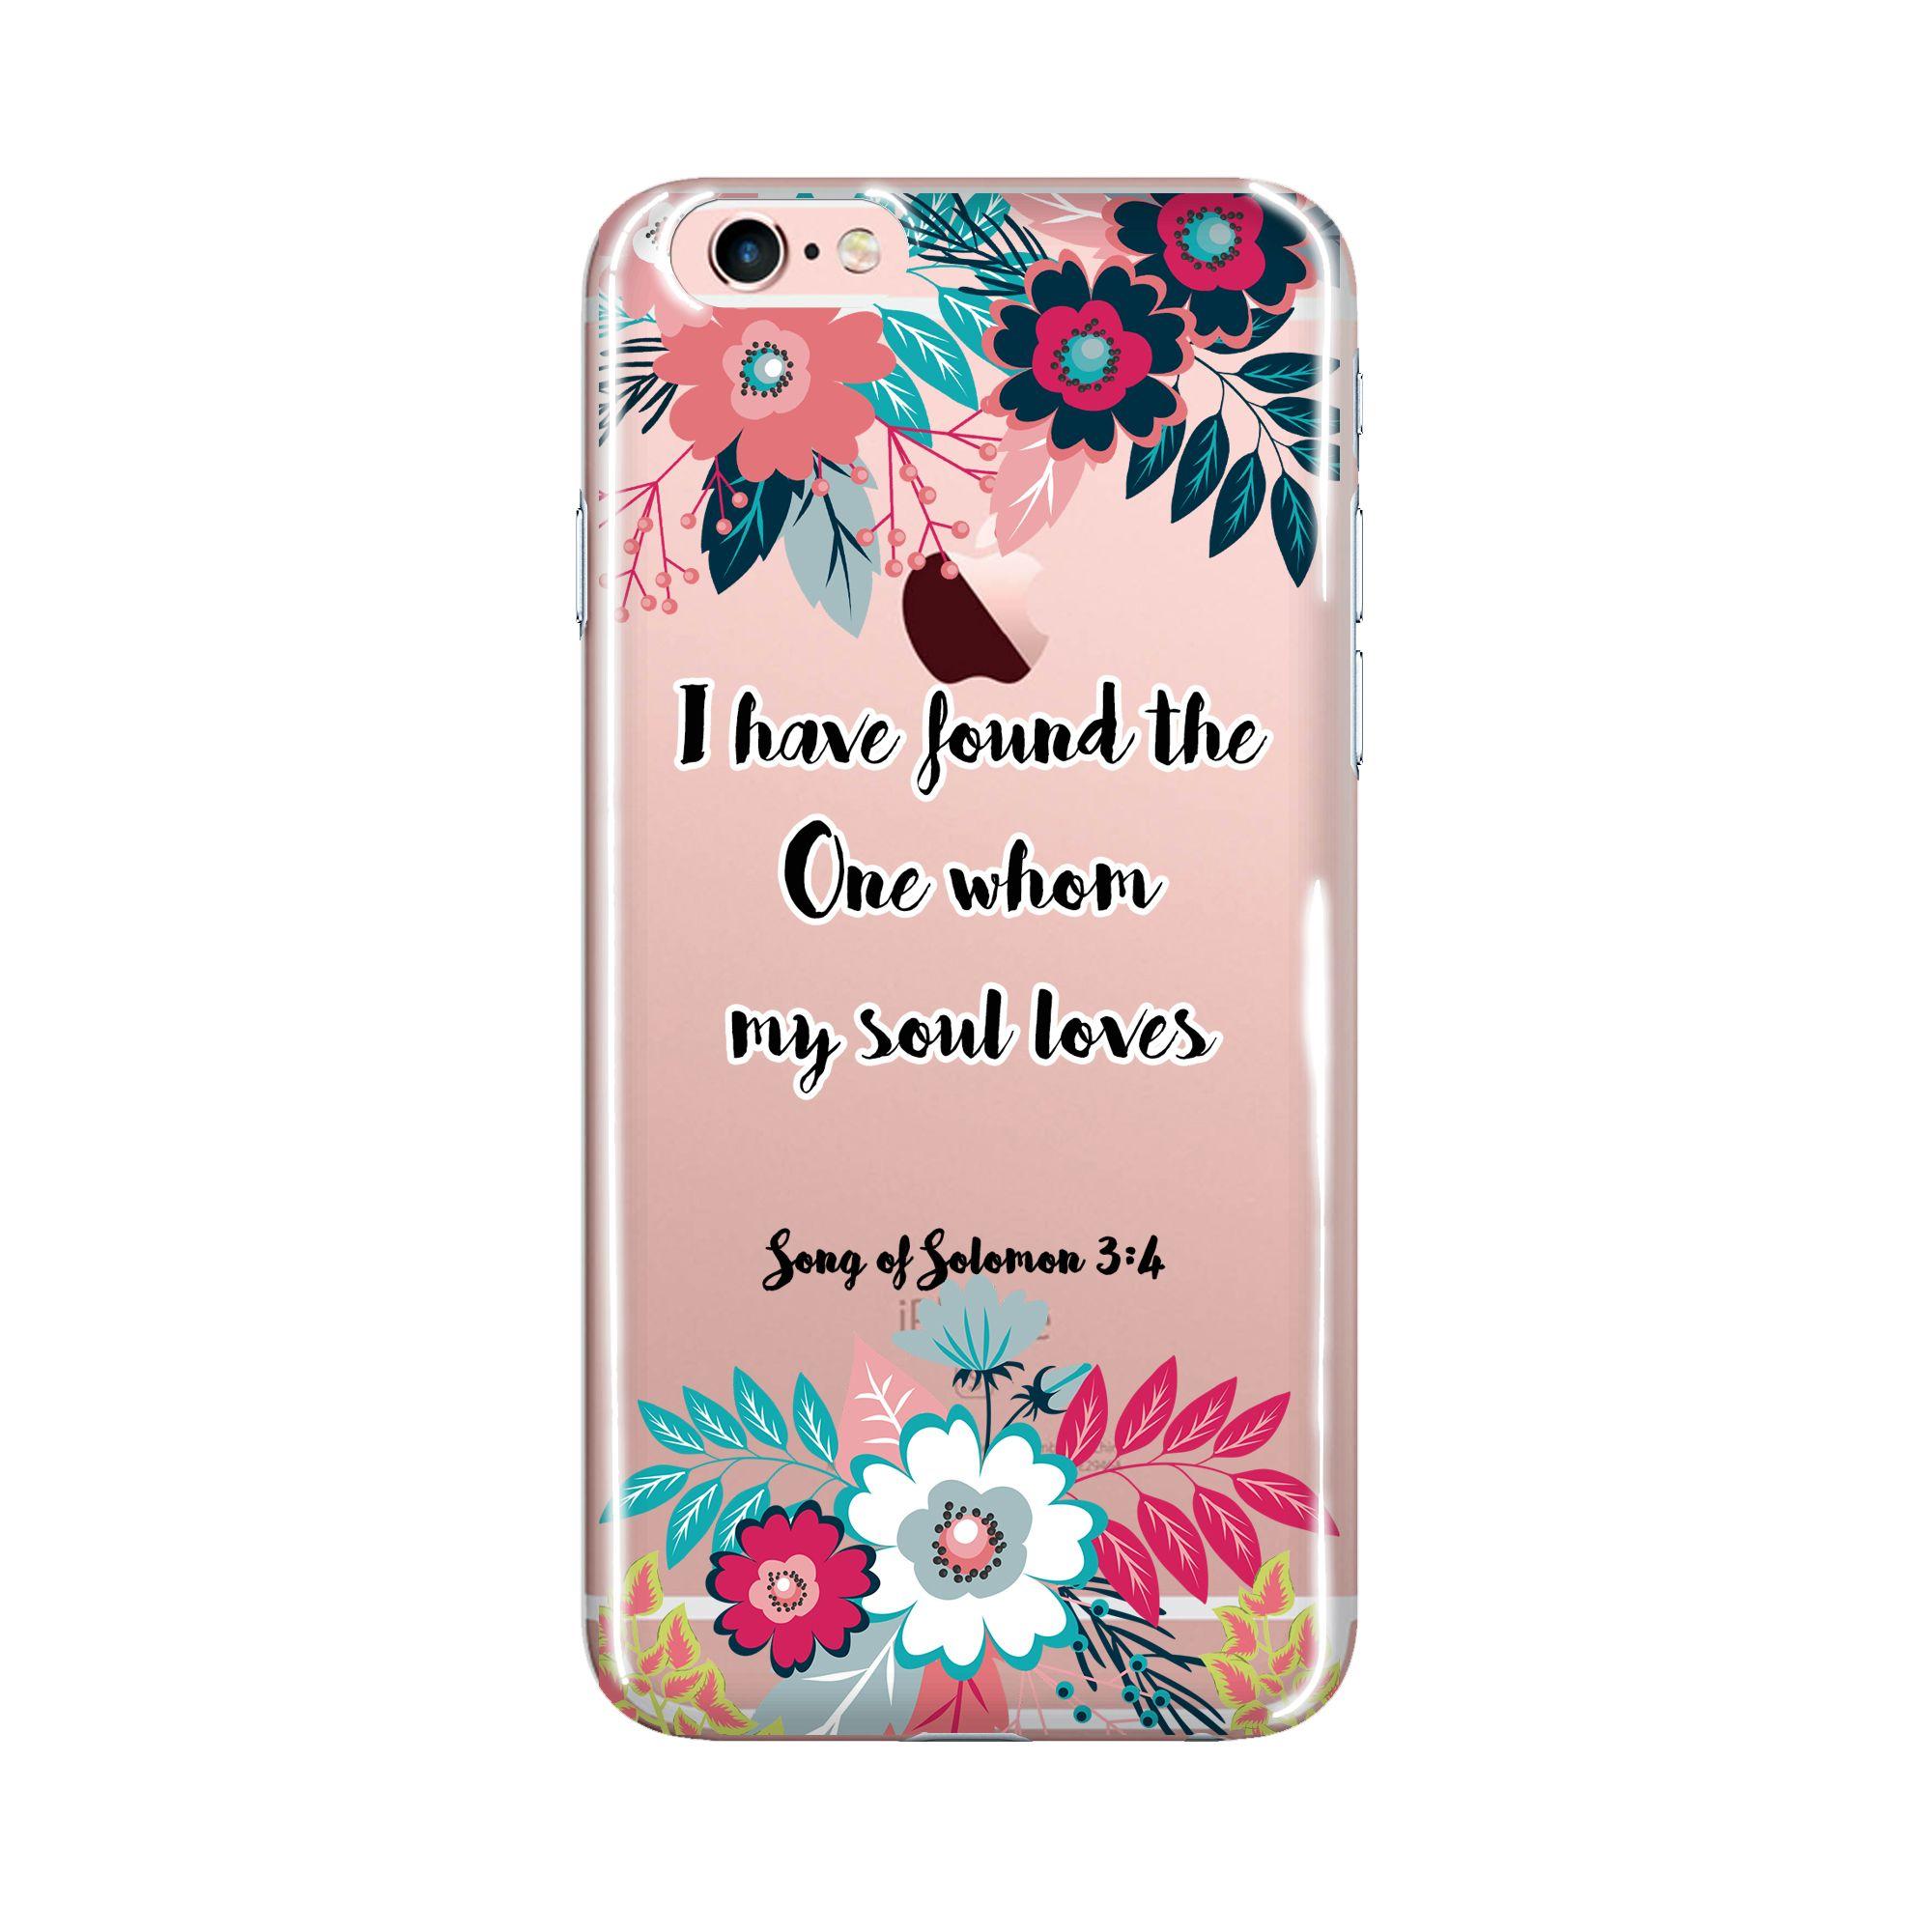 new concept e1f27 b8098 iPhone Case Bible Verse, Clear Transparent Phone Case, Bible ...